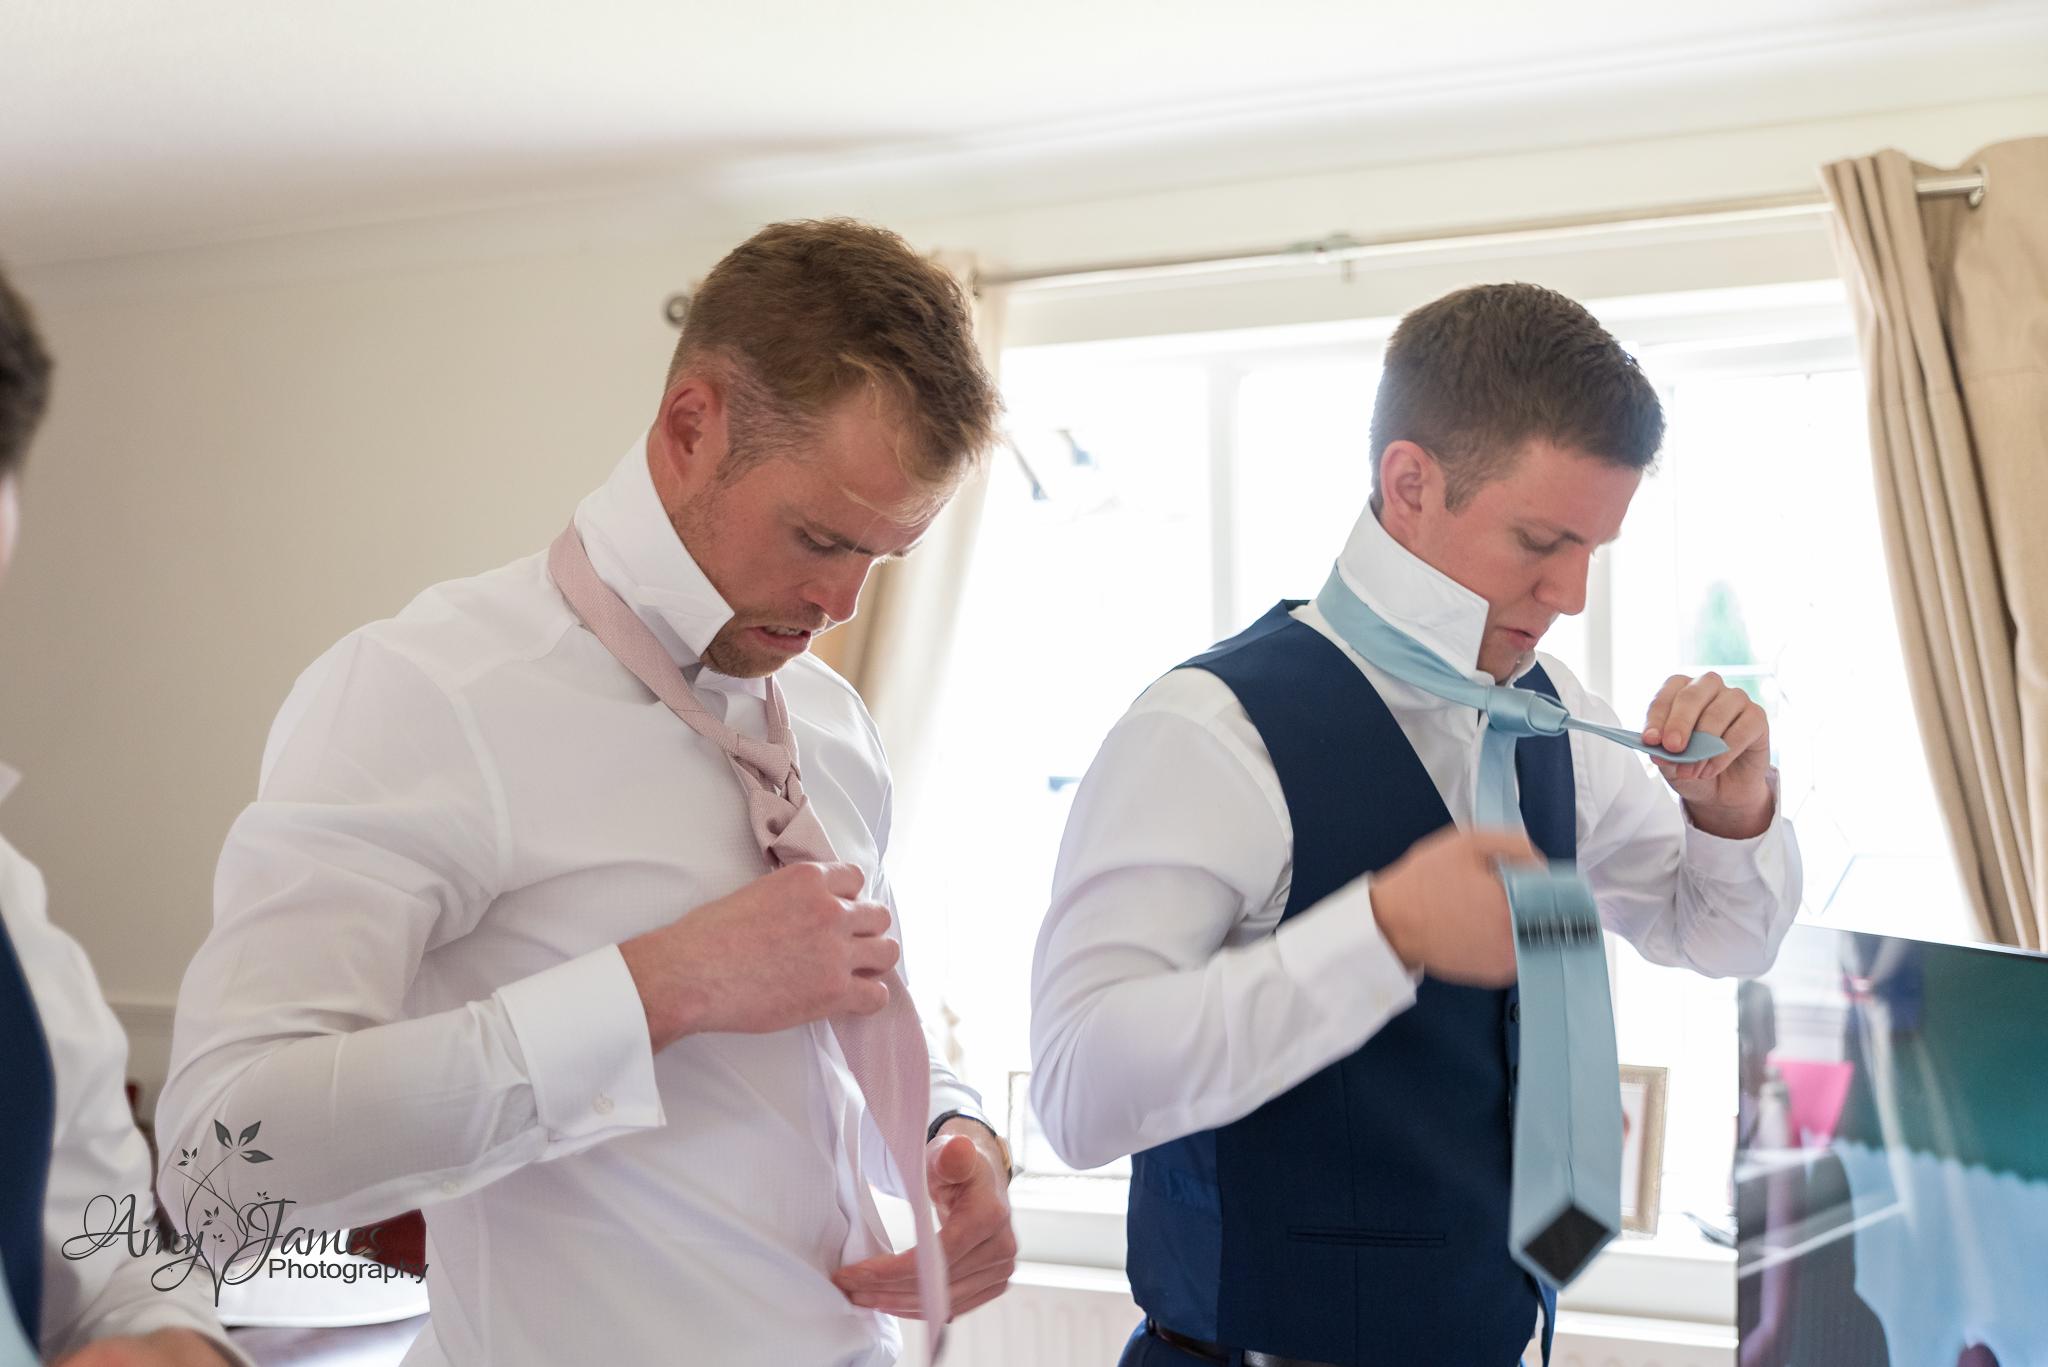 Fleet wedding photographer / Hampshire wedding photographer / Warbrook House wedding / Aldershot garrison wedding